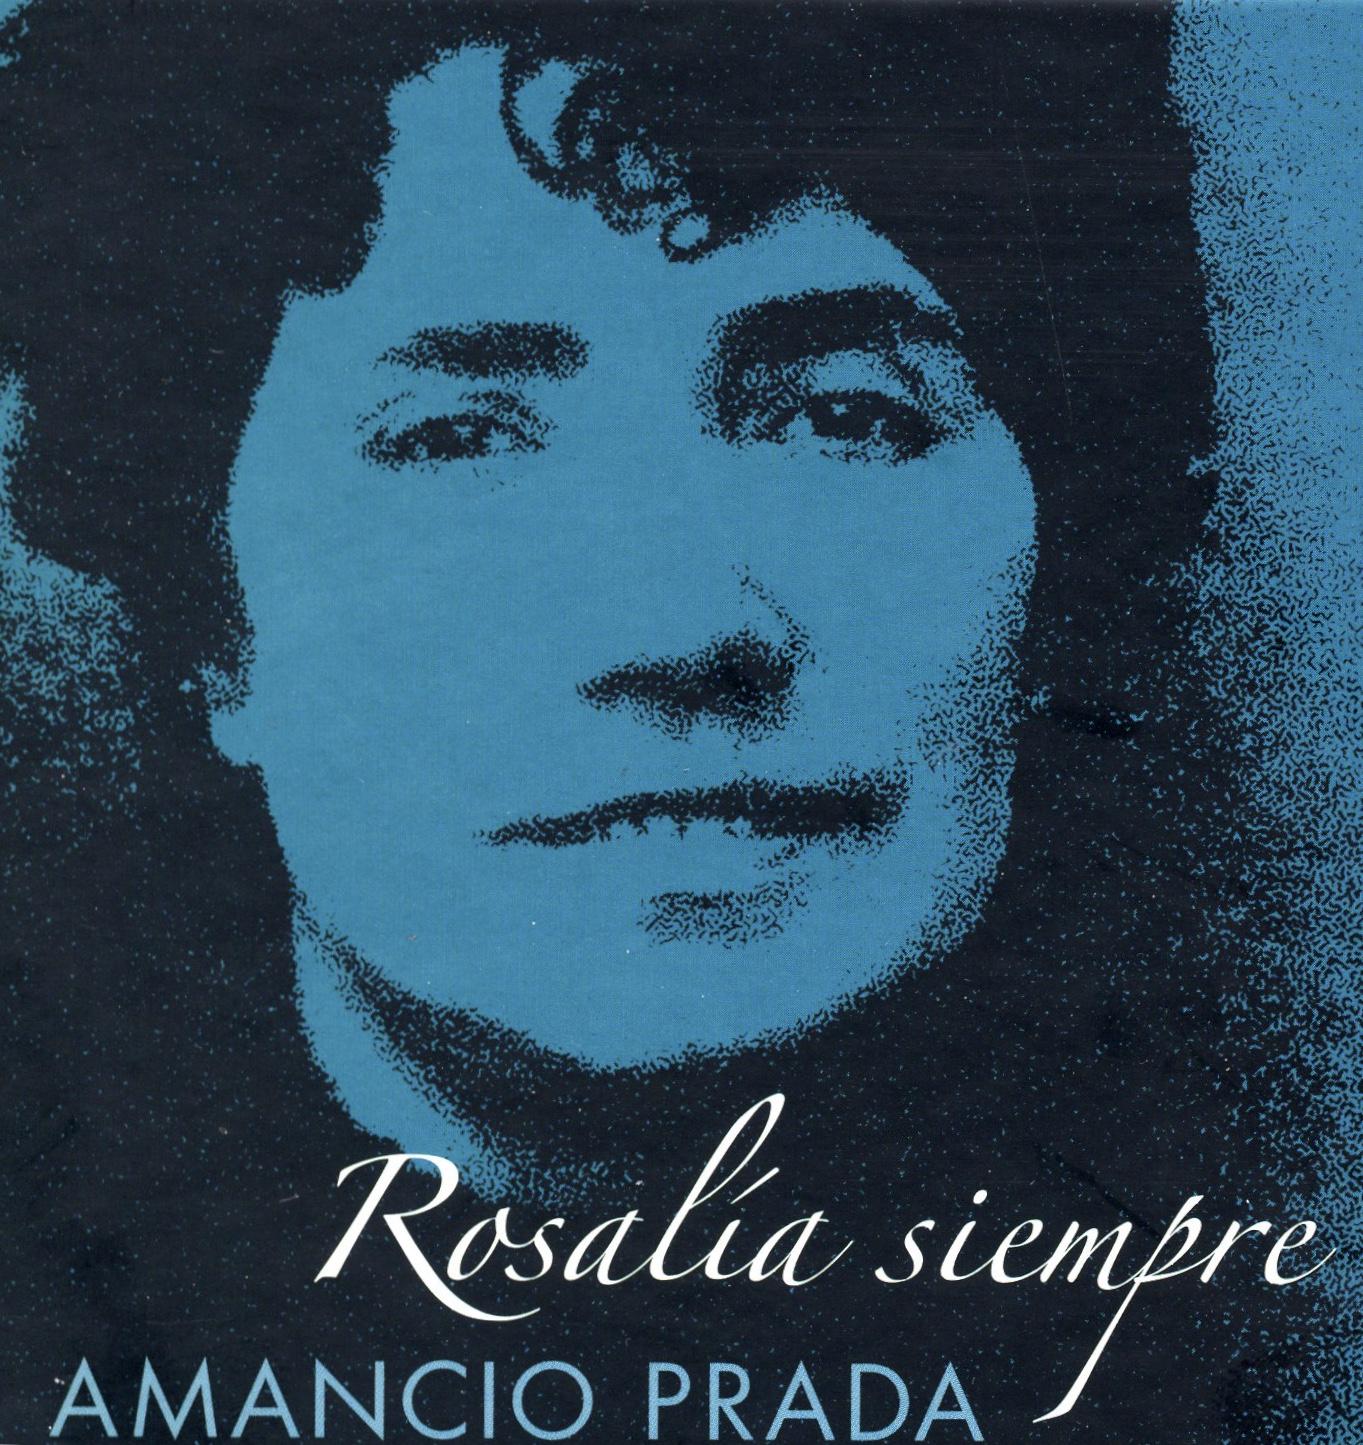 ROSALIA SIEMPRE